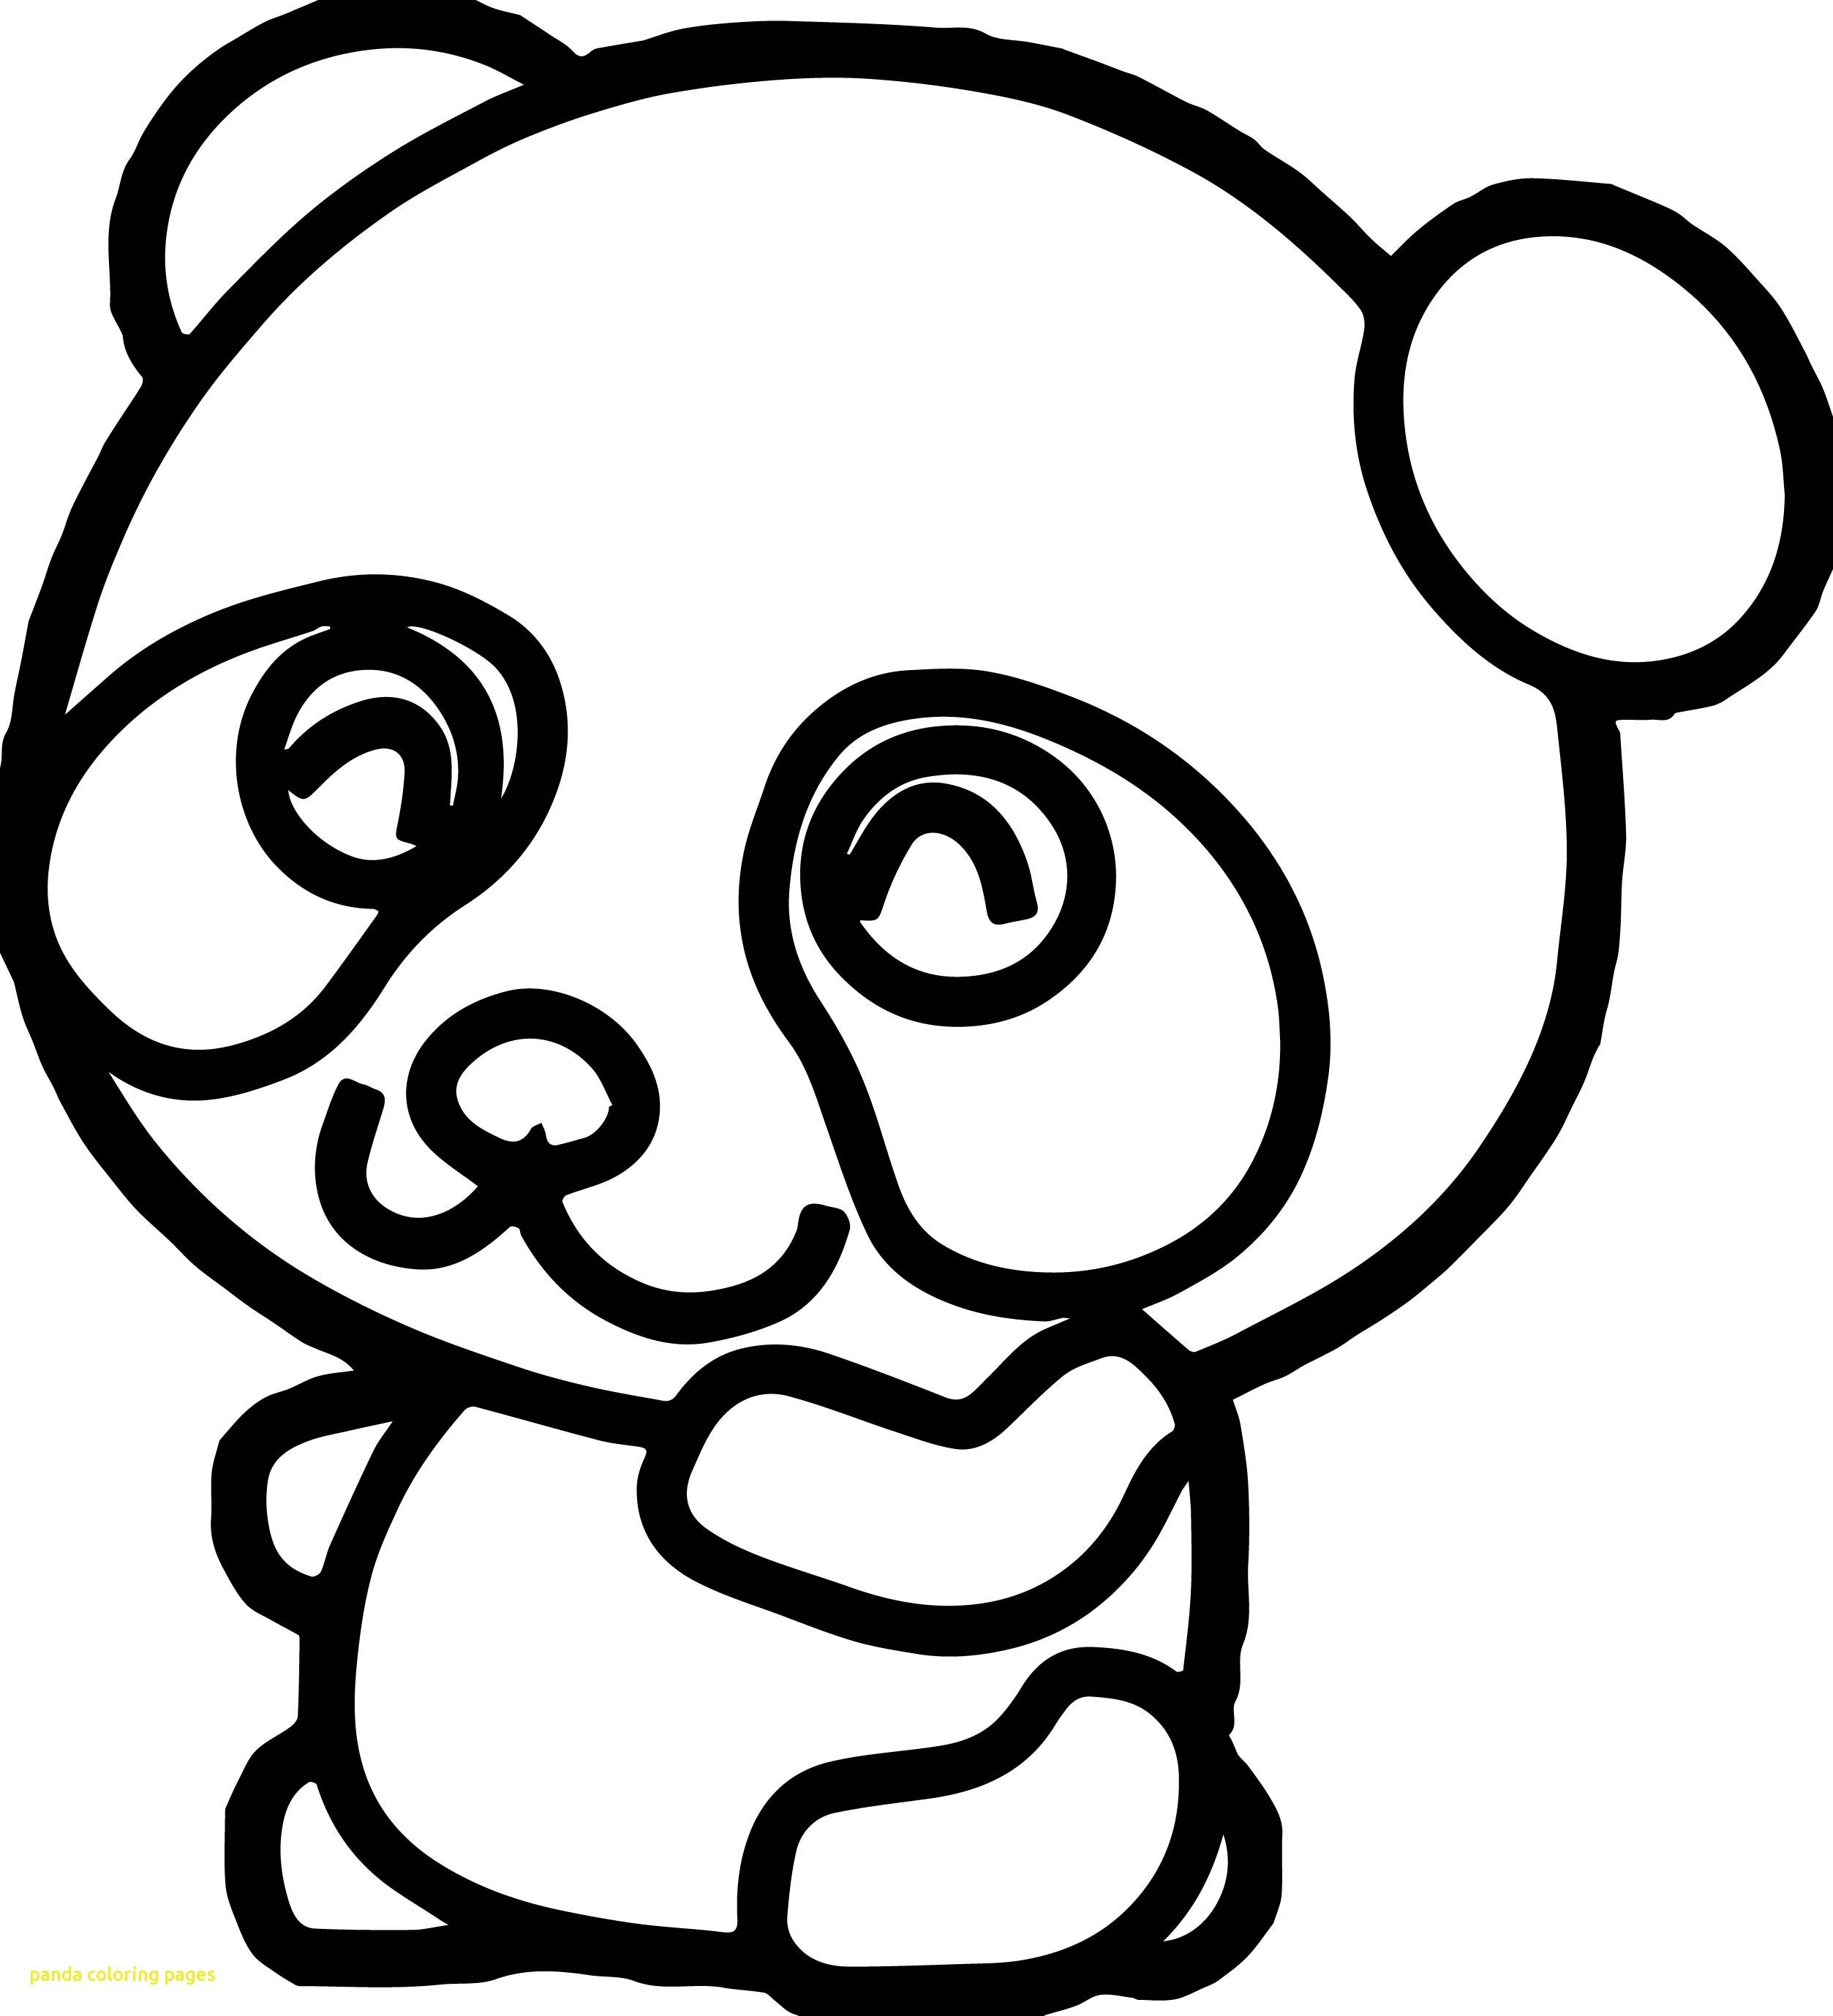 Panda Coloring Pages At Getdrawings Free Download